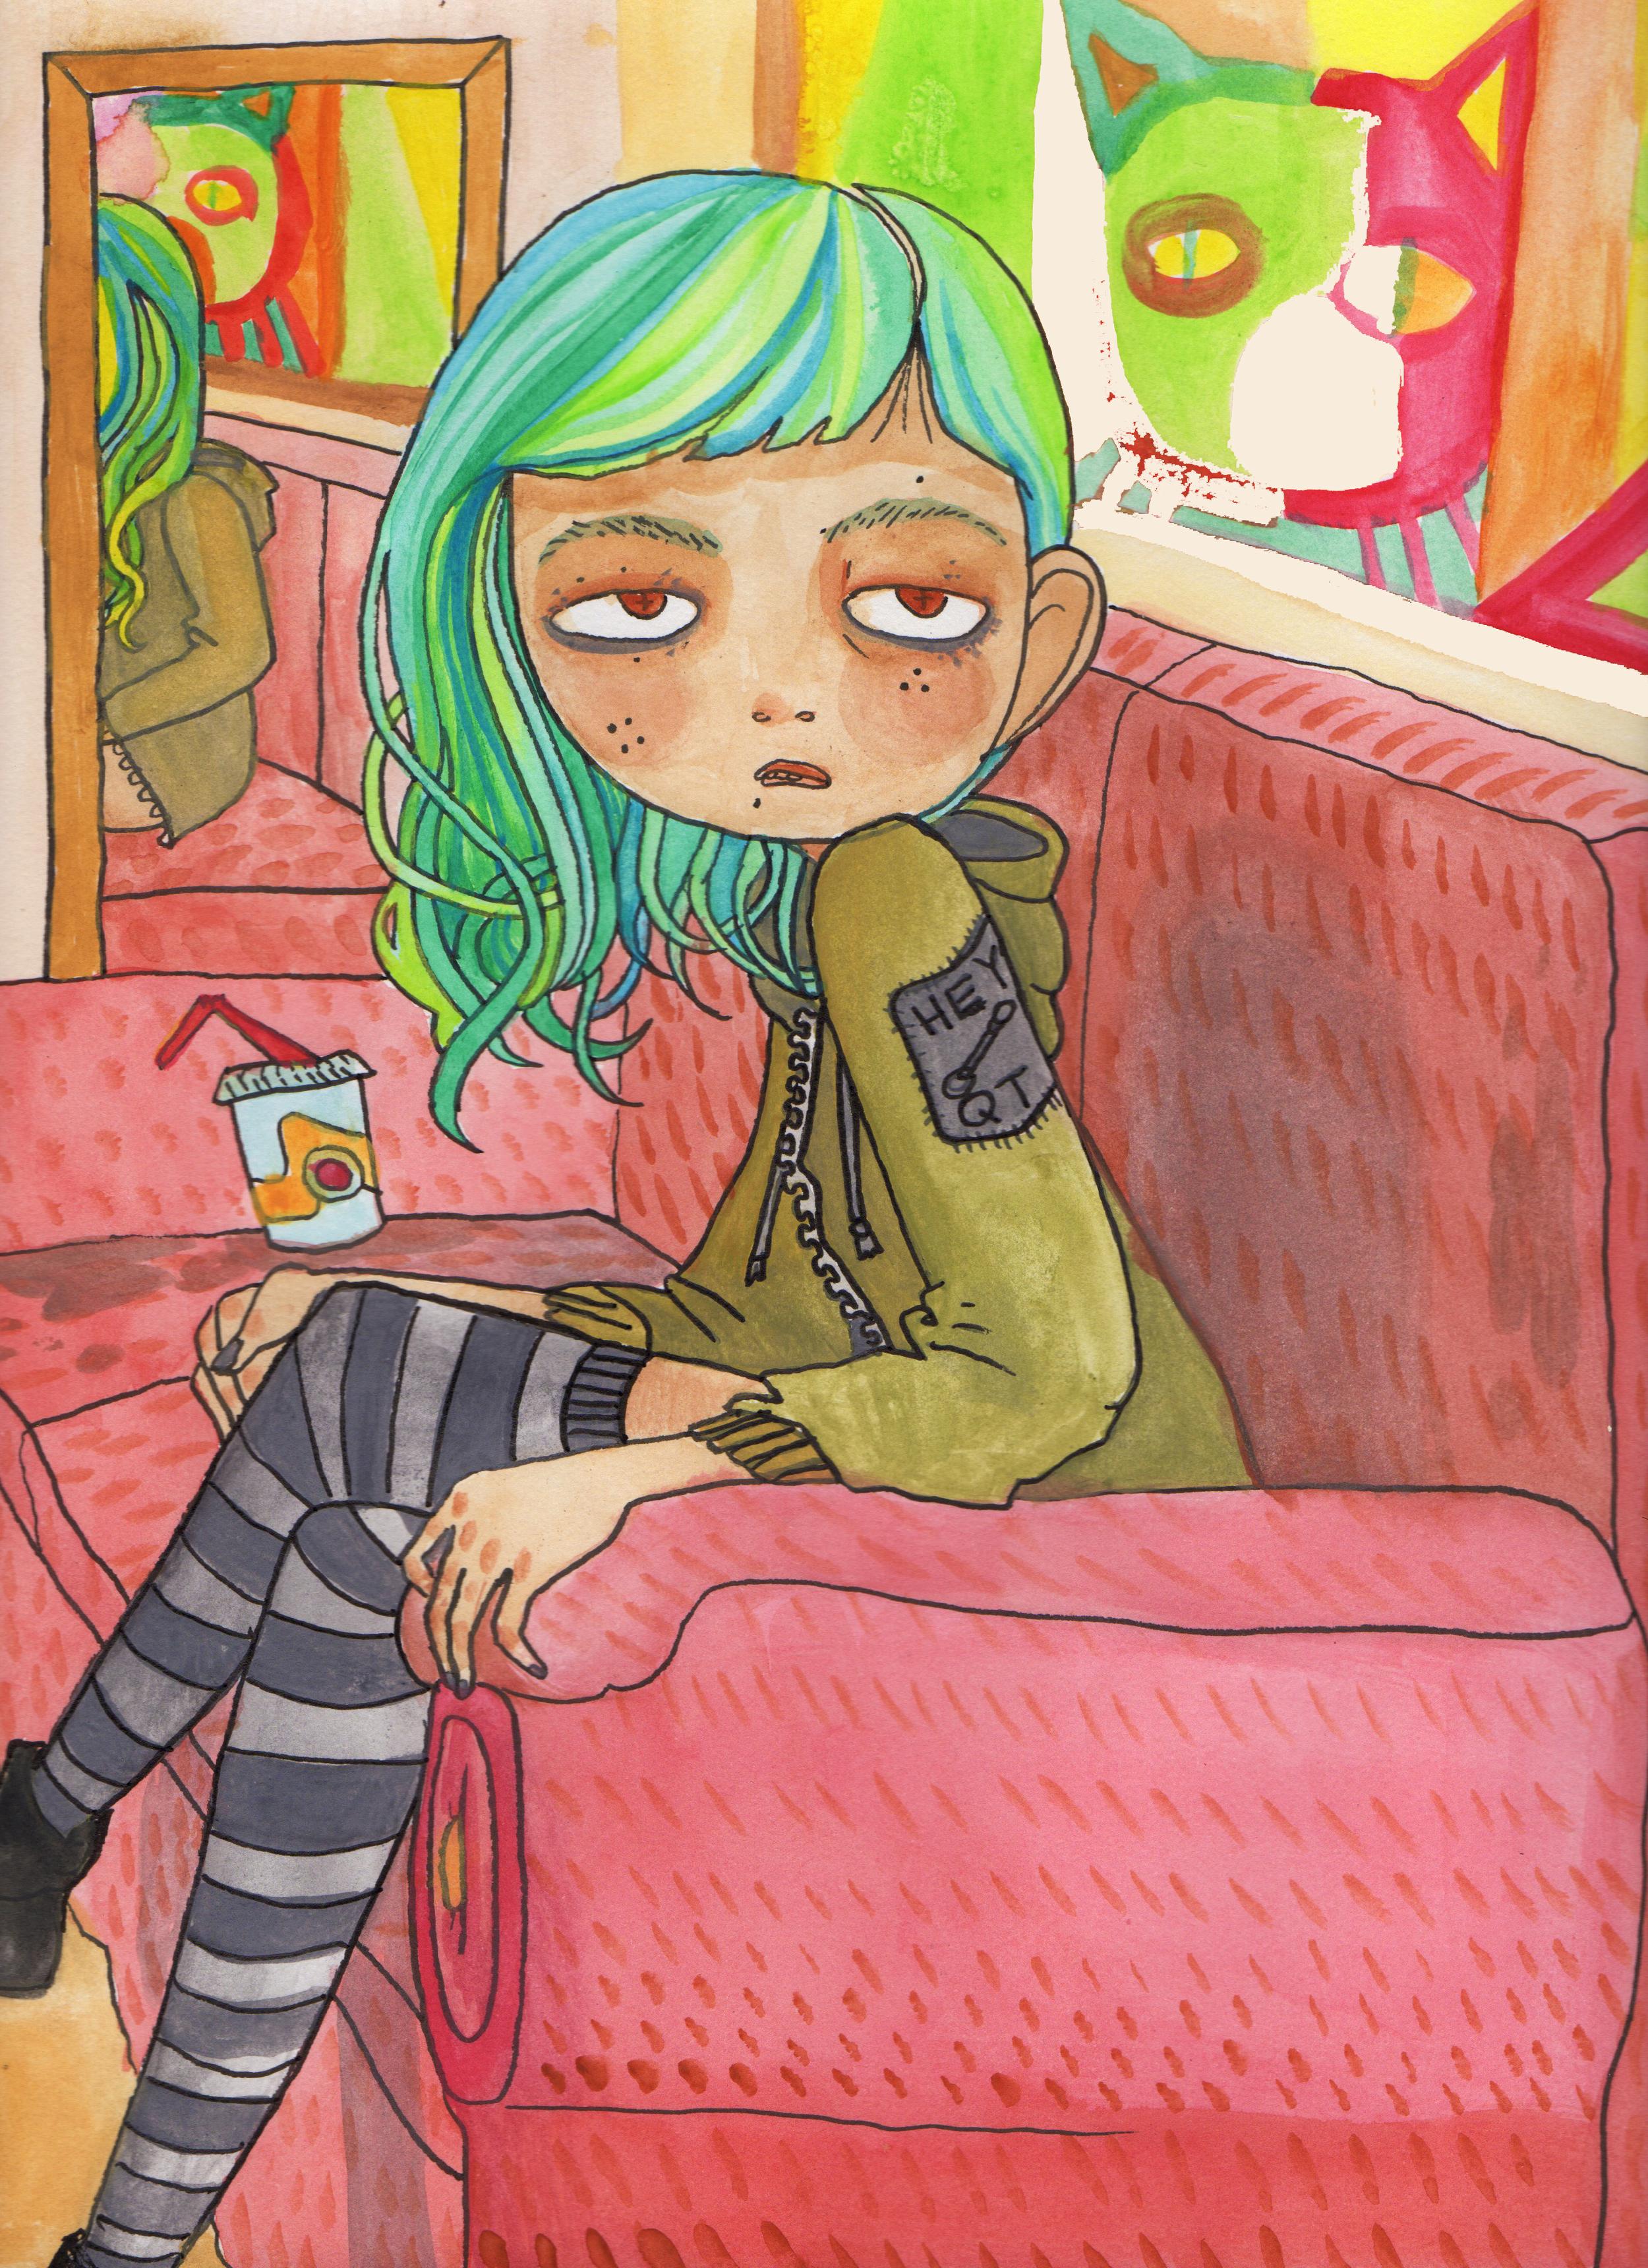 Current Mood. Watercolor. 2016  Featured on Rowan Blanchard's ( Girl Meets World )Instagram